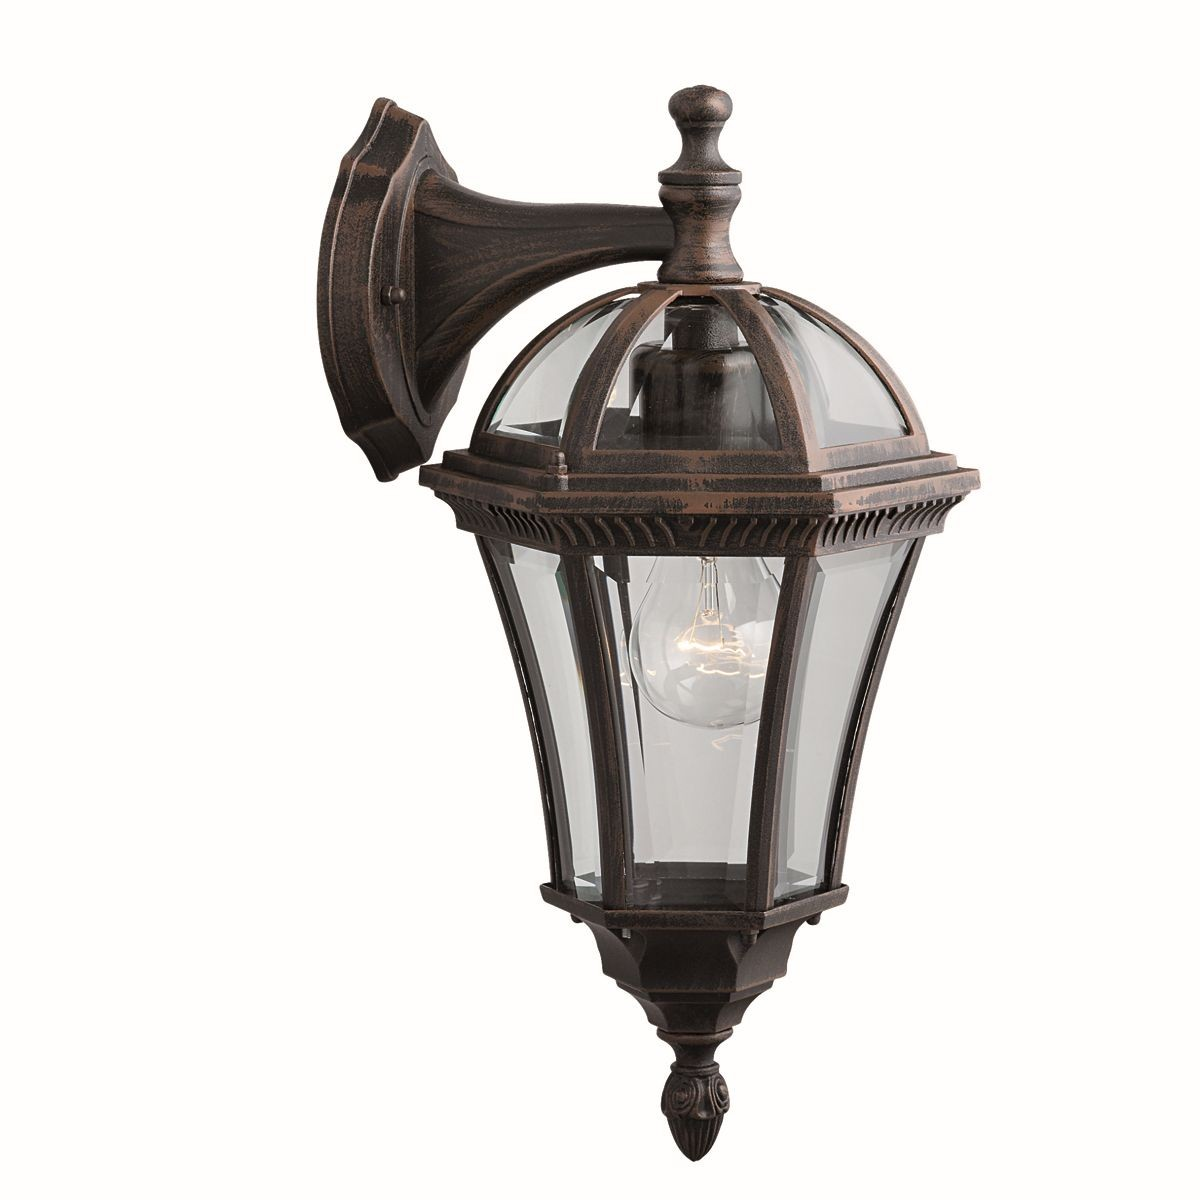 Capri outdoor light wall down lantern - Lamparas de pared exterior ...